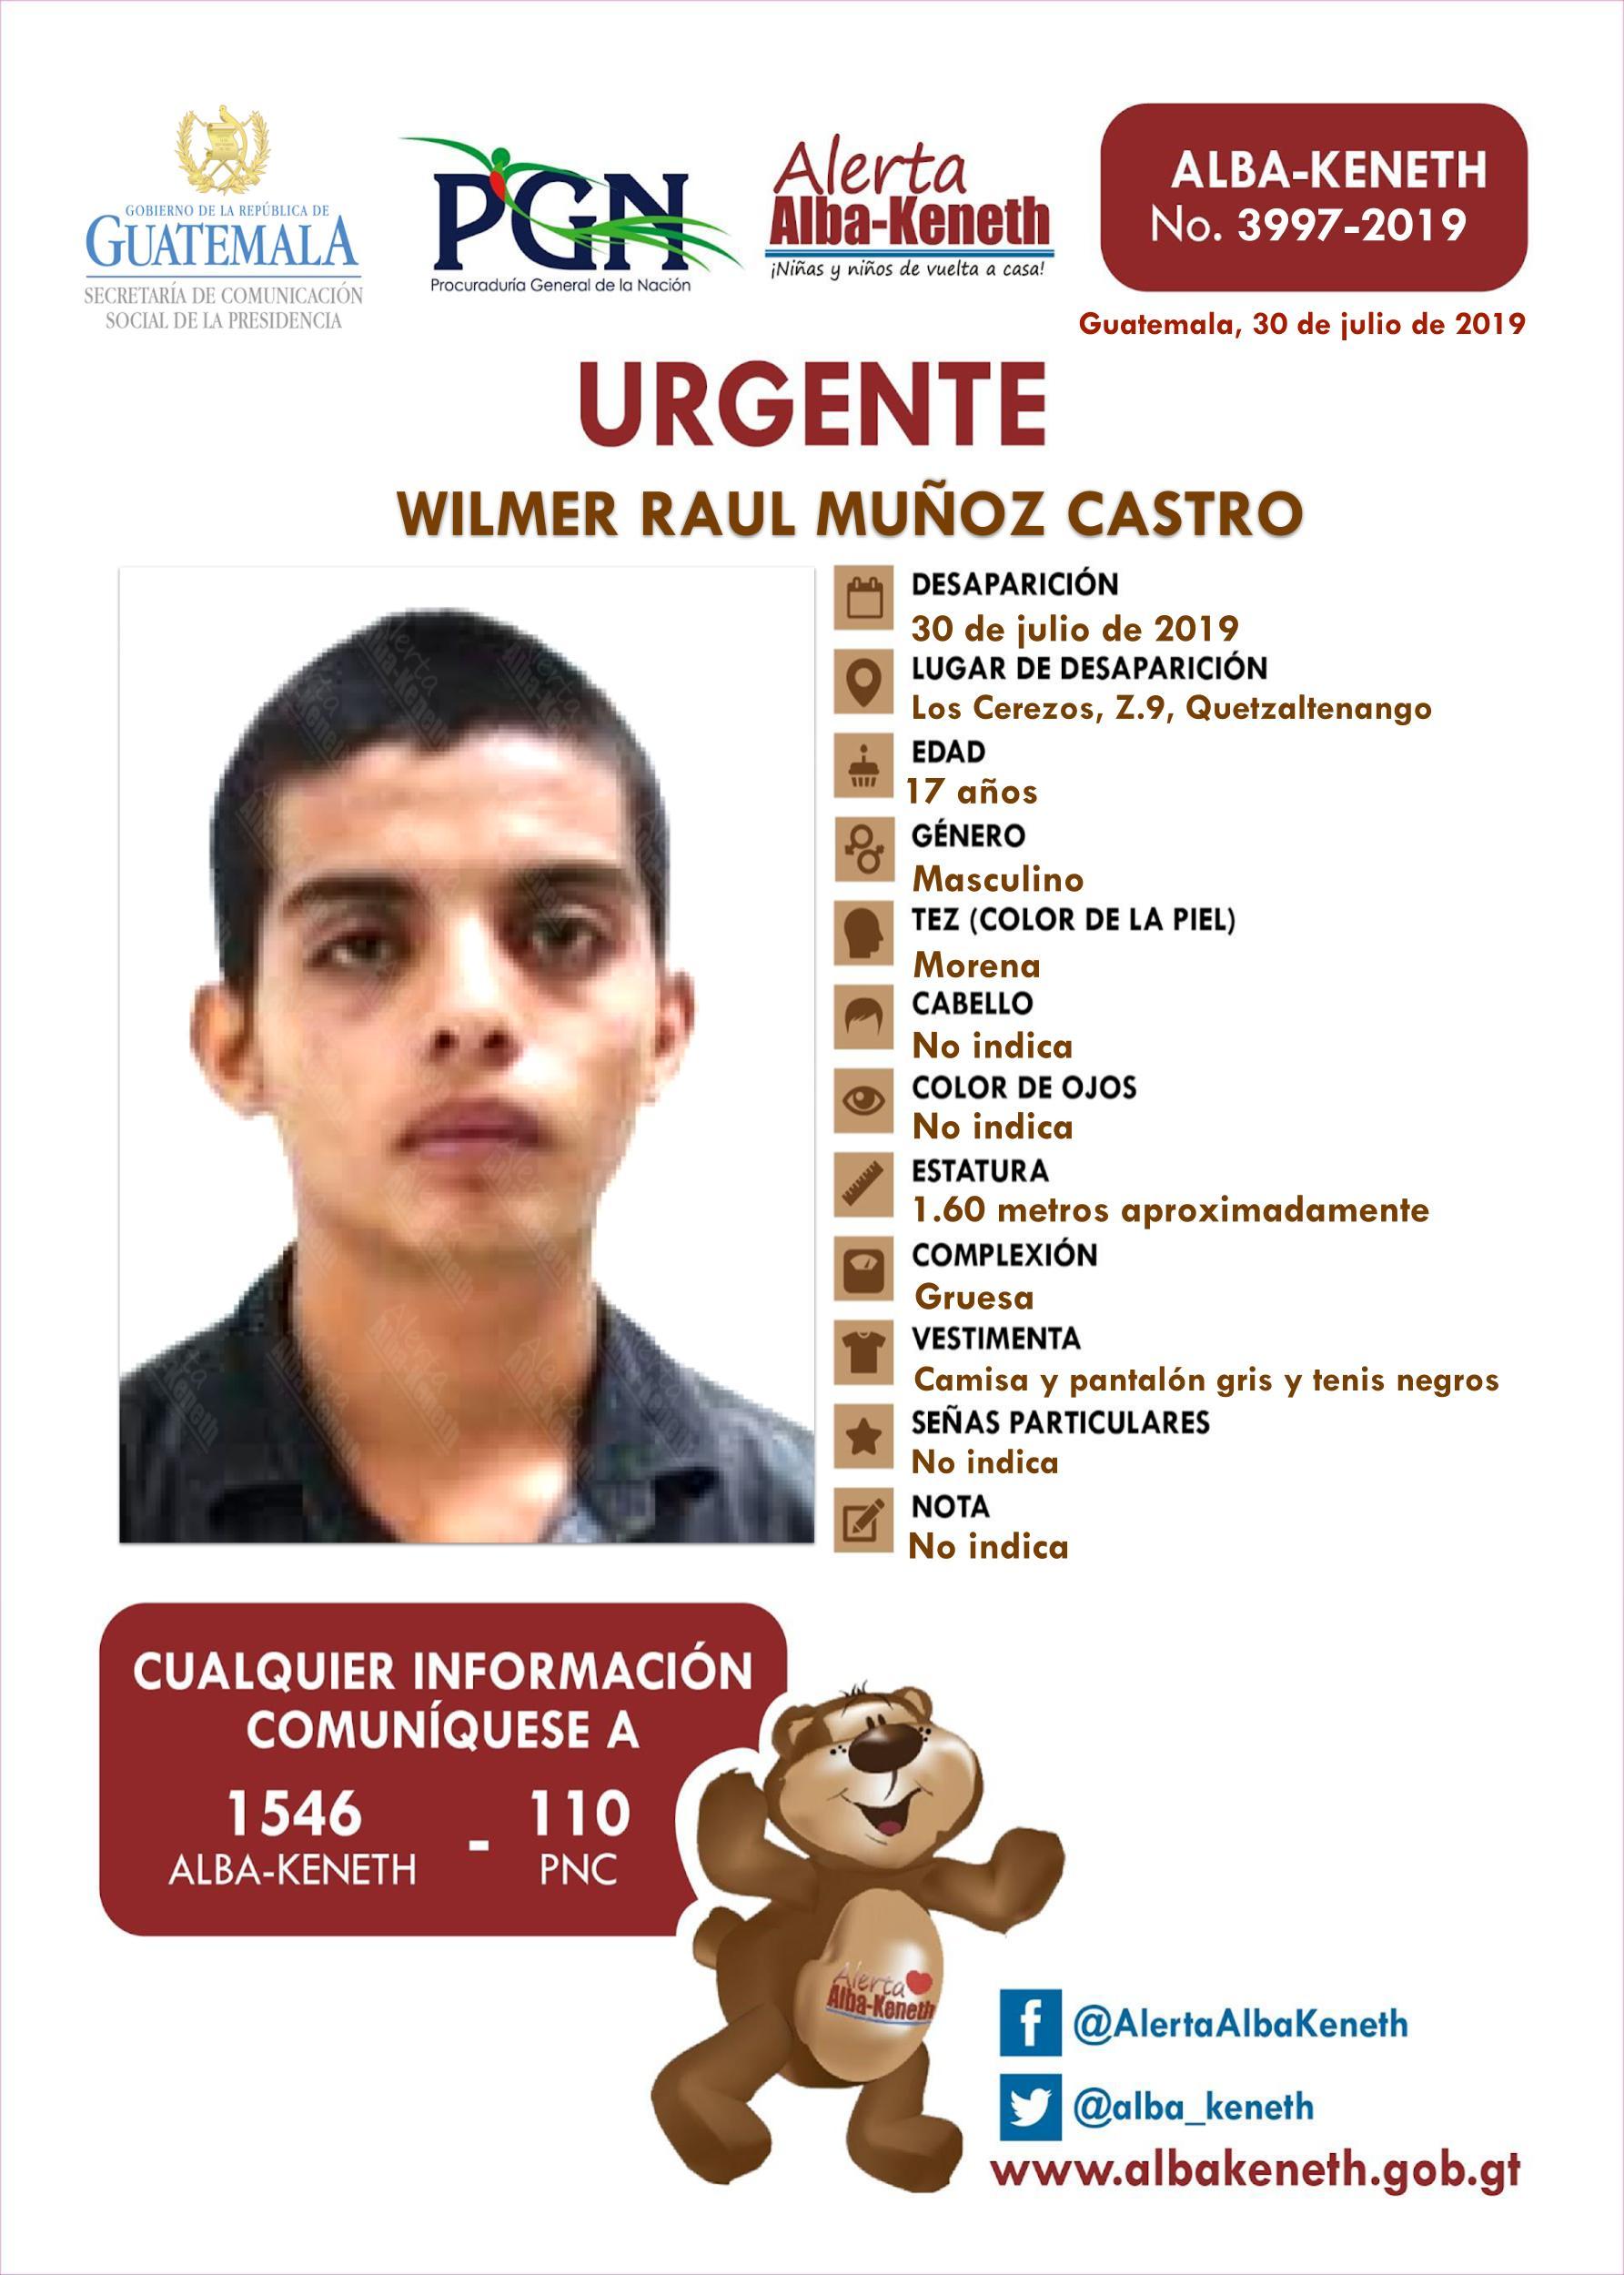 Wilmer Raul Muñoz Castro